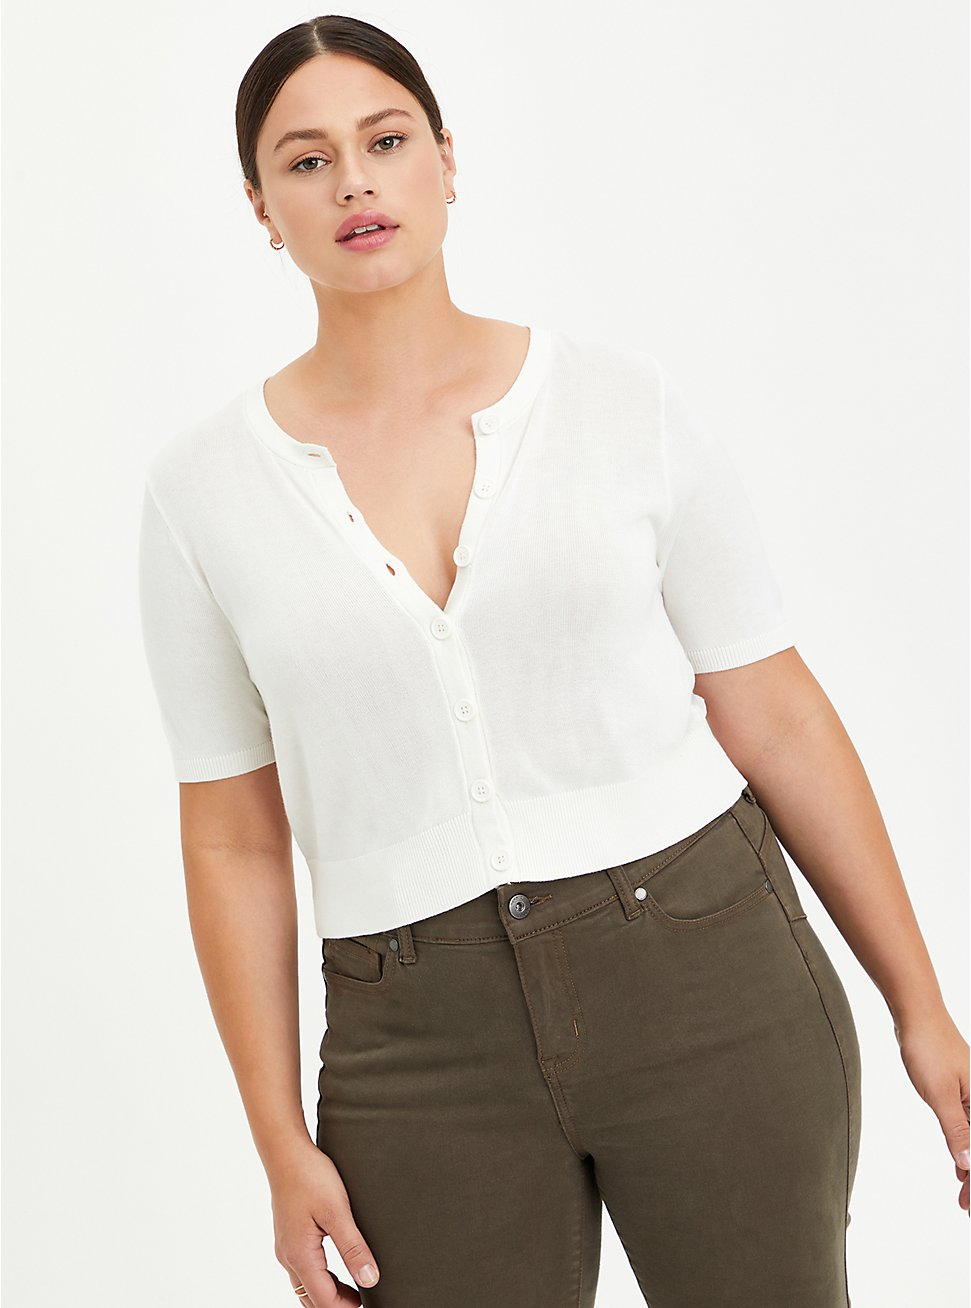 Crop Cardigan Sweater - Rayon + Clip Dot Chiffon White, BRIGHT WHITE, hi-res